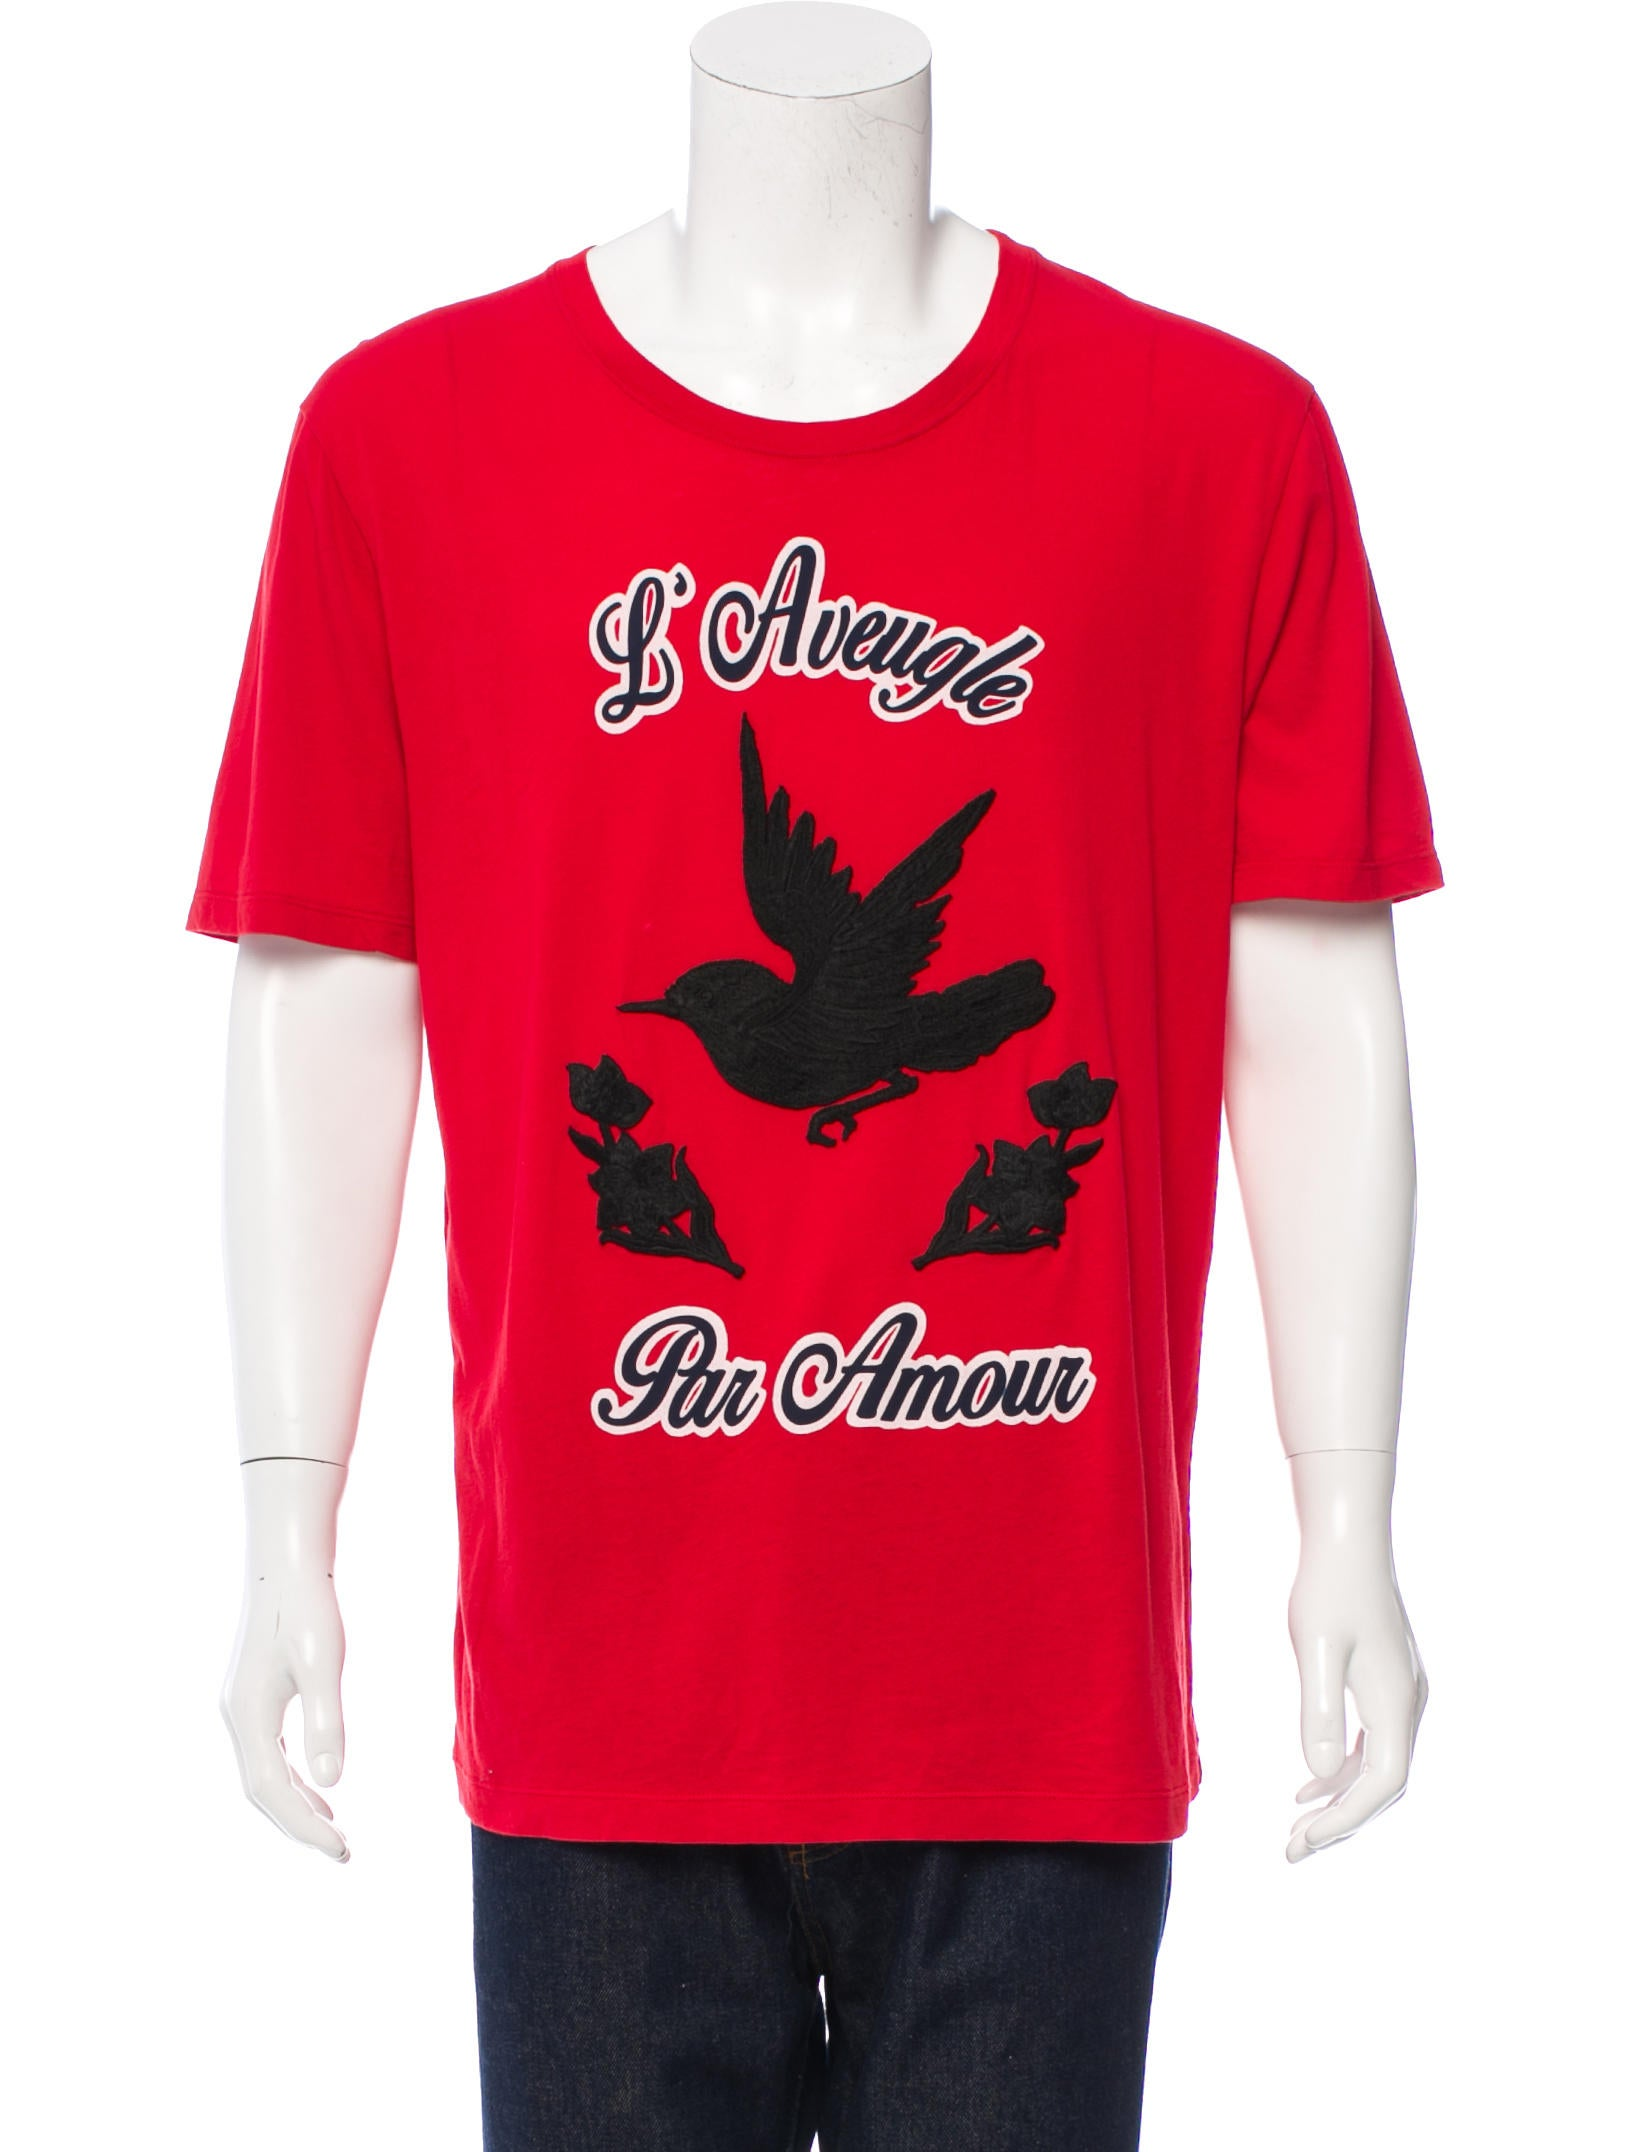 3ae4fcfd Gucci 2016 L'Aveugle Par Amour T-Shirt - Clothing - GUC105945 | The ...